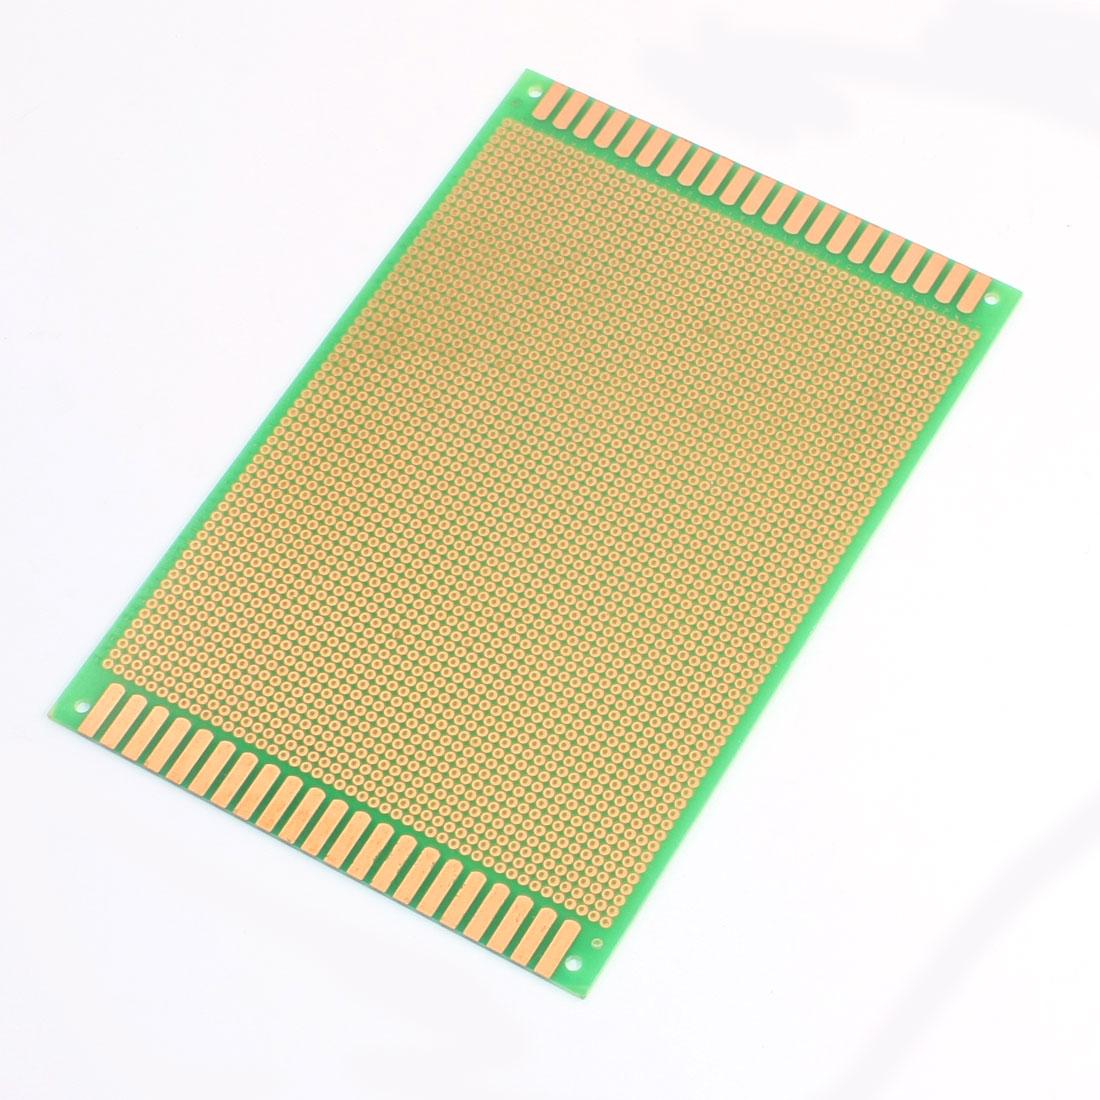 Prototyping Green One Side Universal Copper PCB Board Stripboard 12x18cm